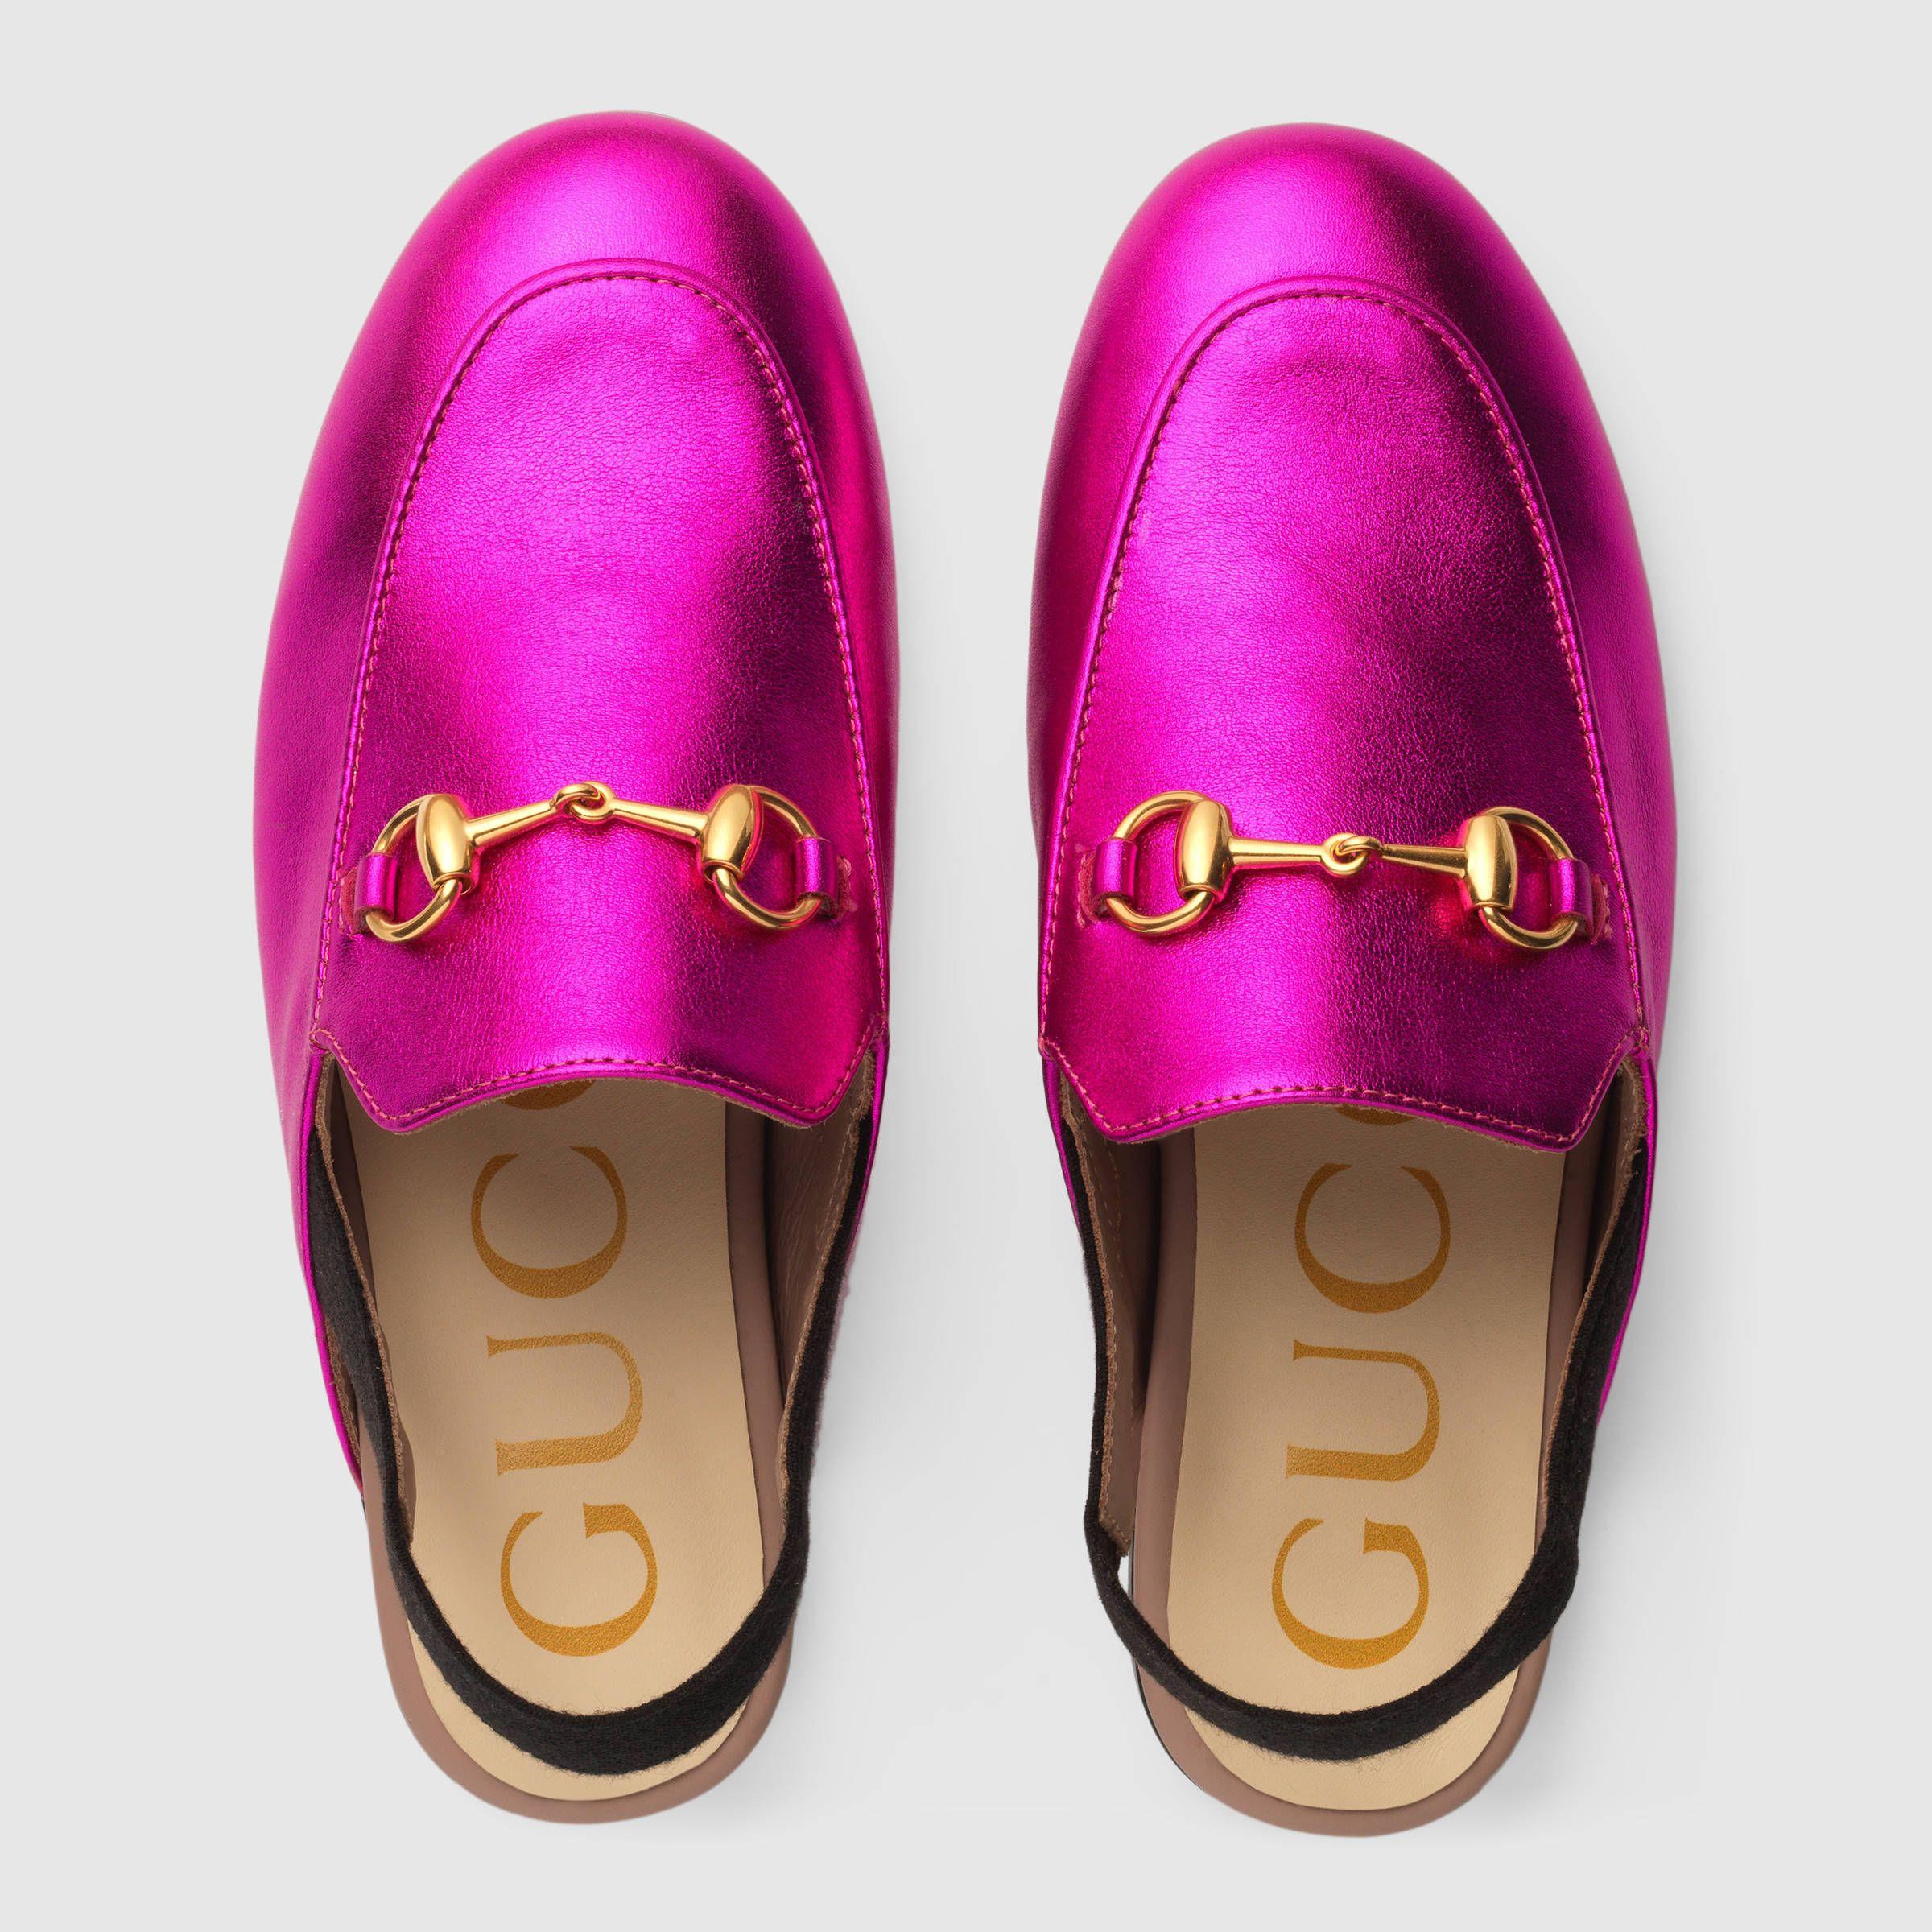 7b63e137c Gucci Children s Princetown metallic leather slipper Detail 3